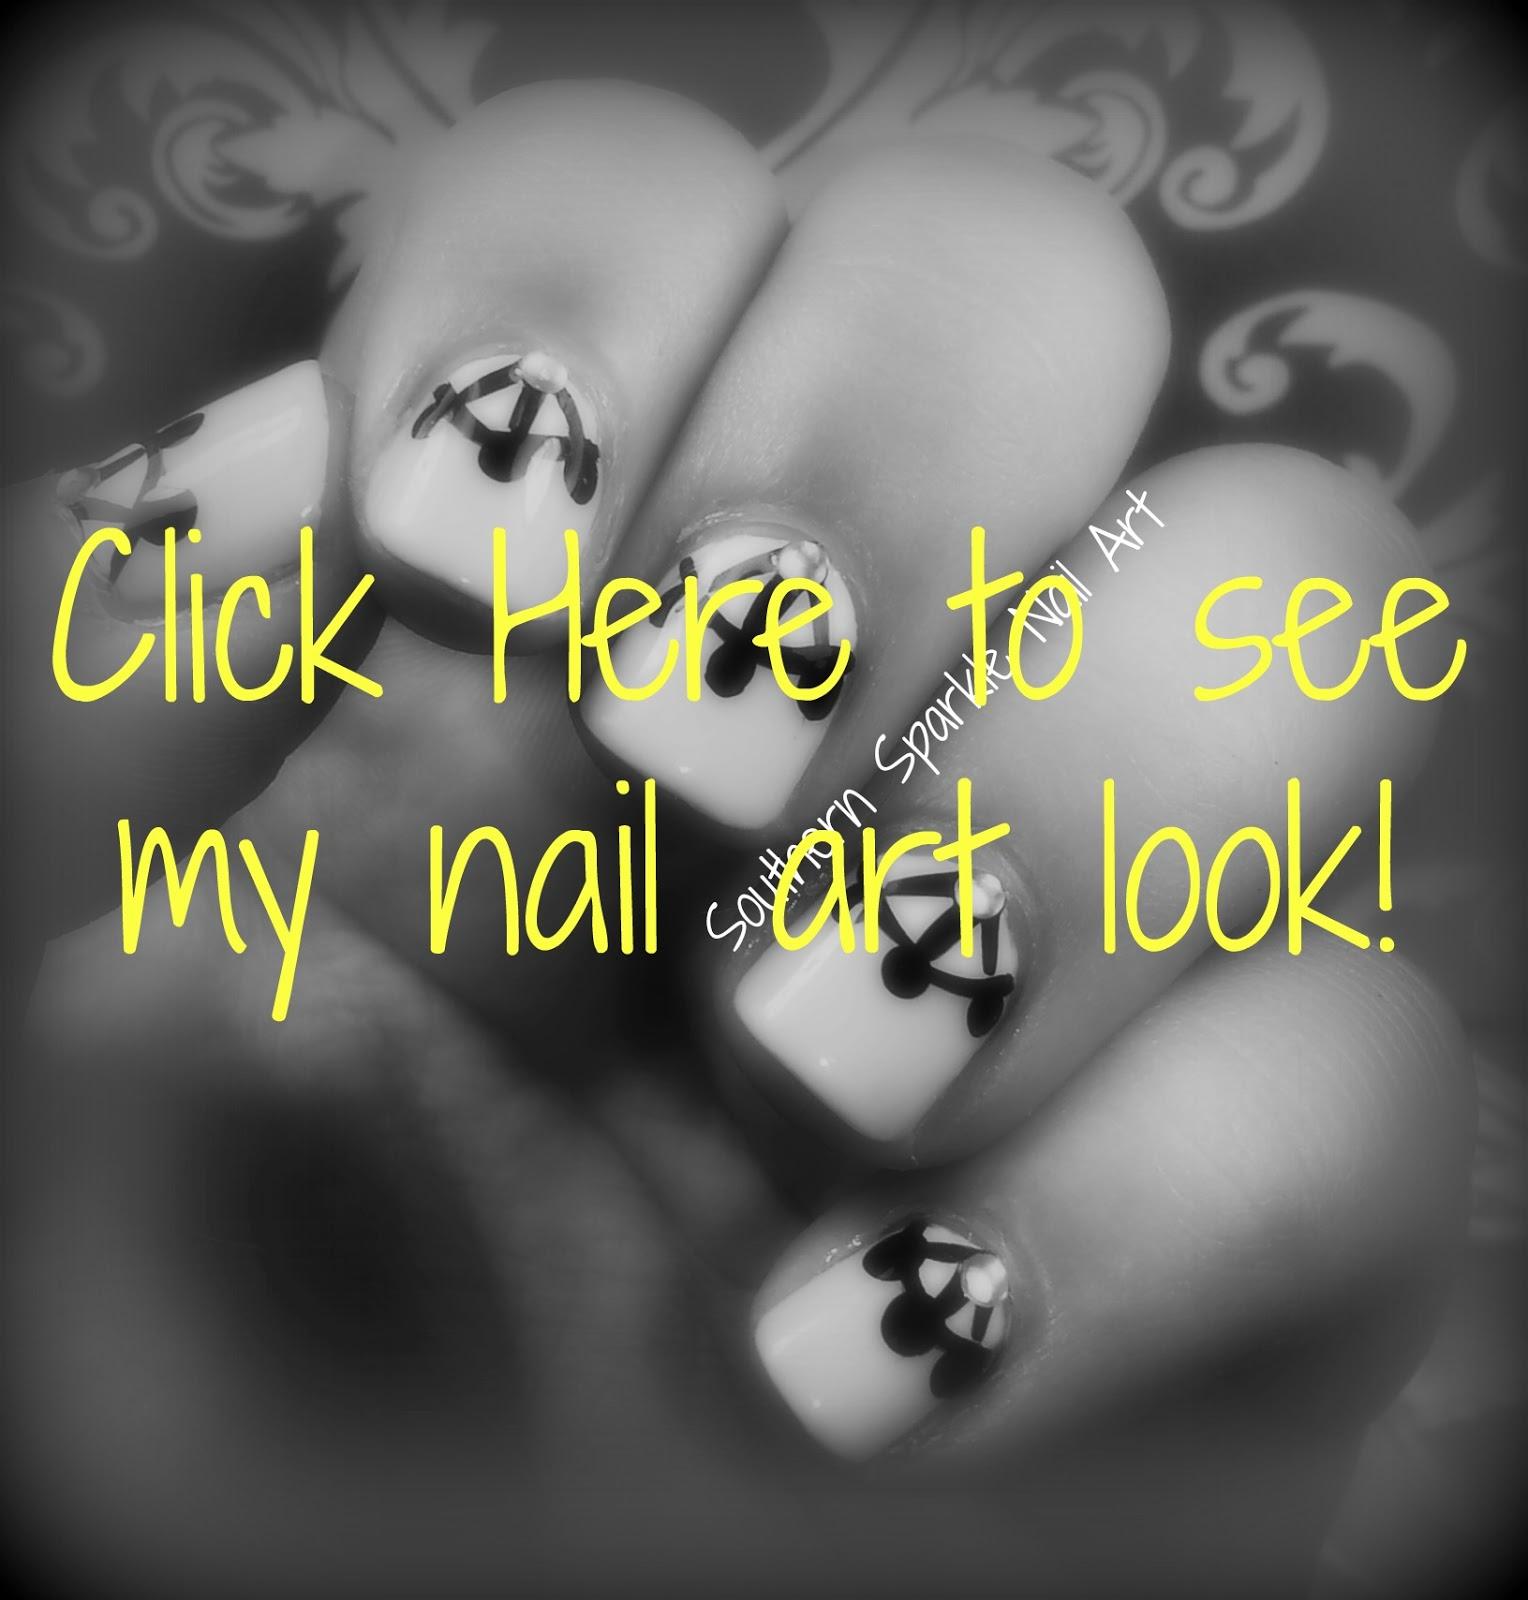 http://manisandmakeovers.blogspot.com/2014/08/twinsie-thursday-half-moon-manicure.html